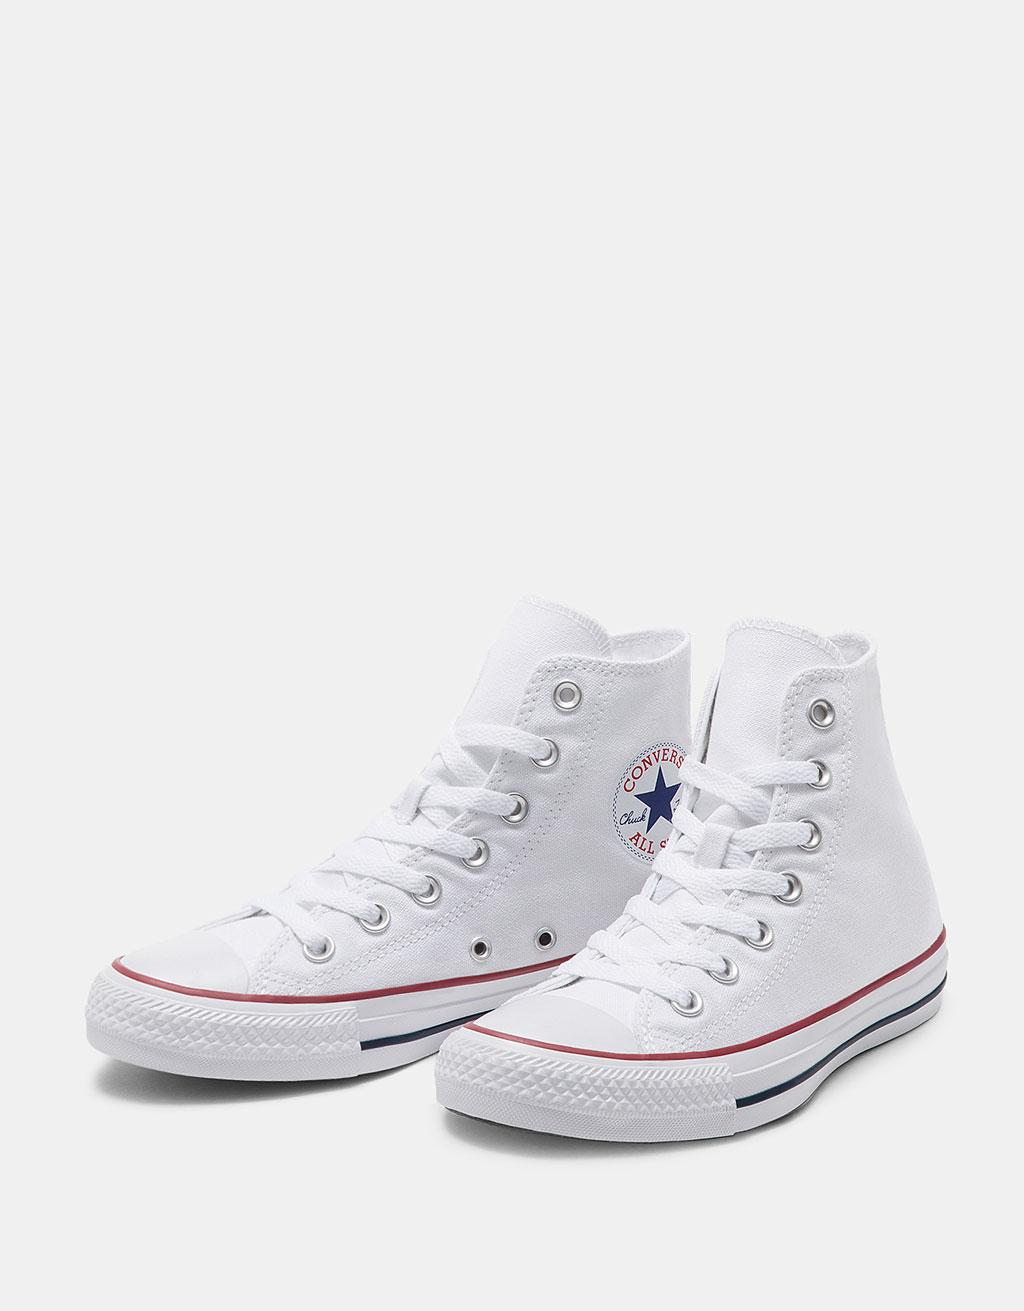 sneakers converse all star uomo